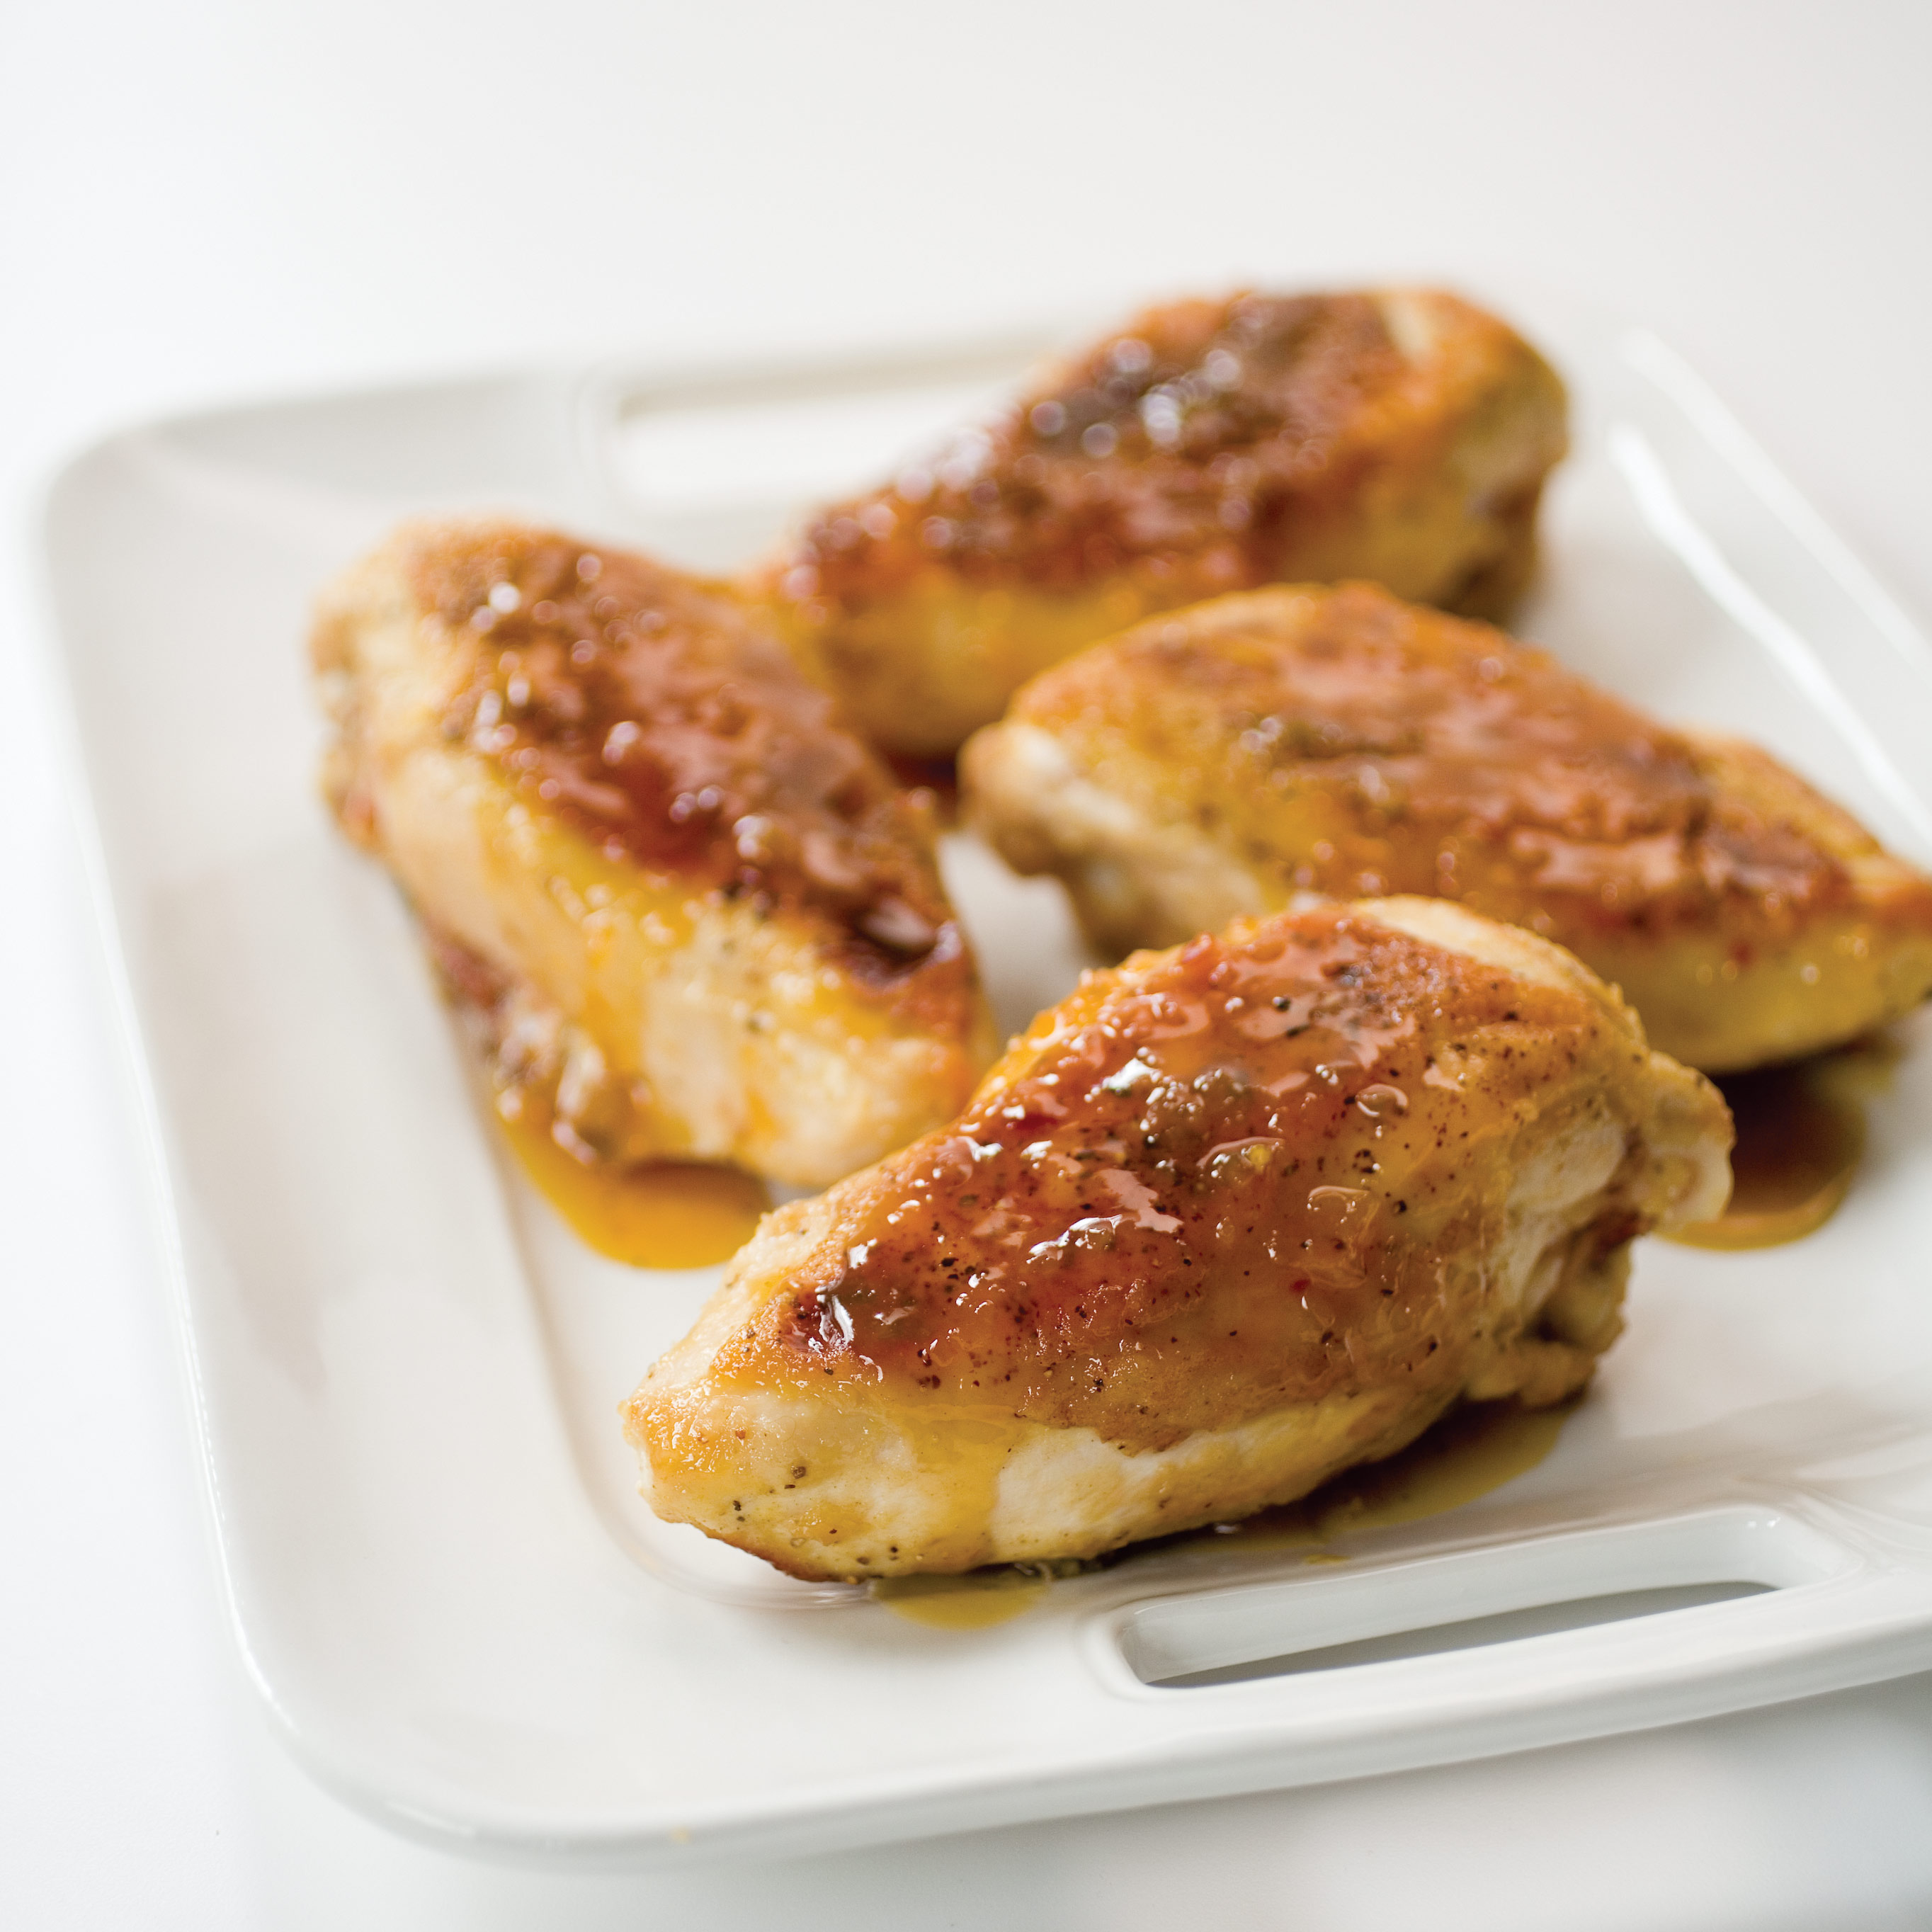 Orange-Honey Glazed Chicken Breasts Recipe - Cook's Illustrated